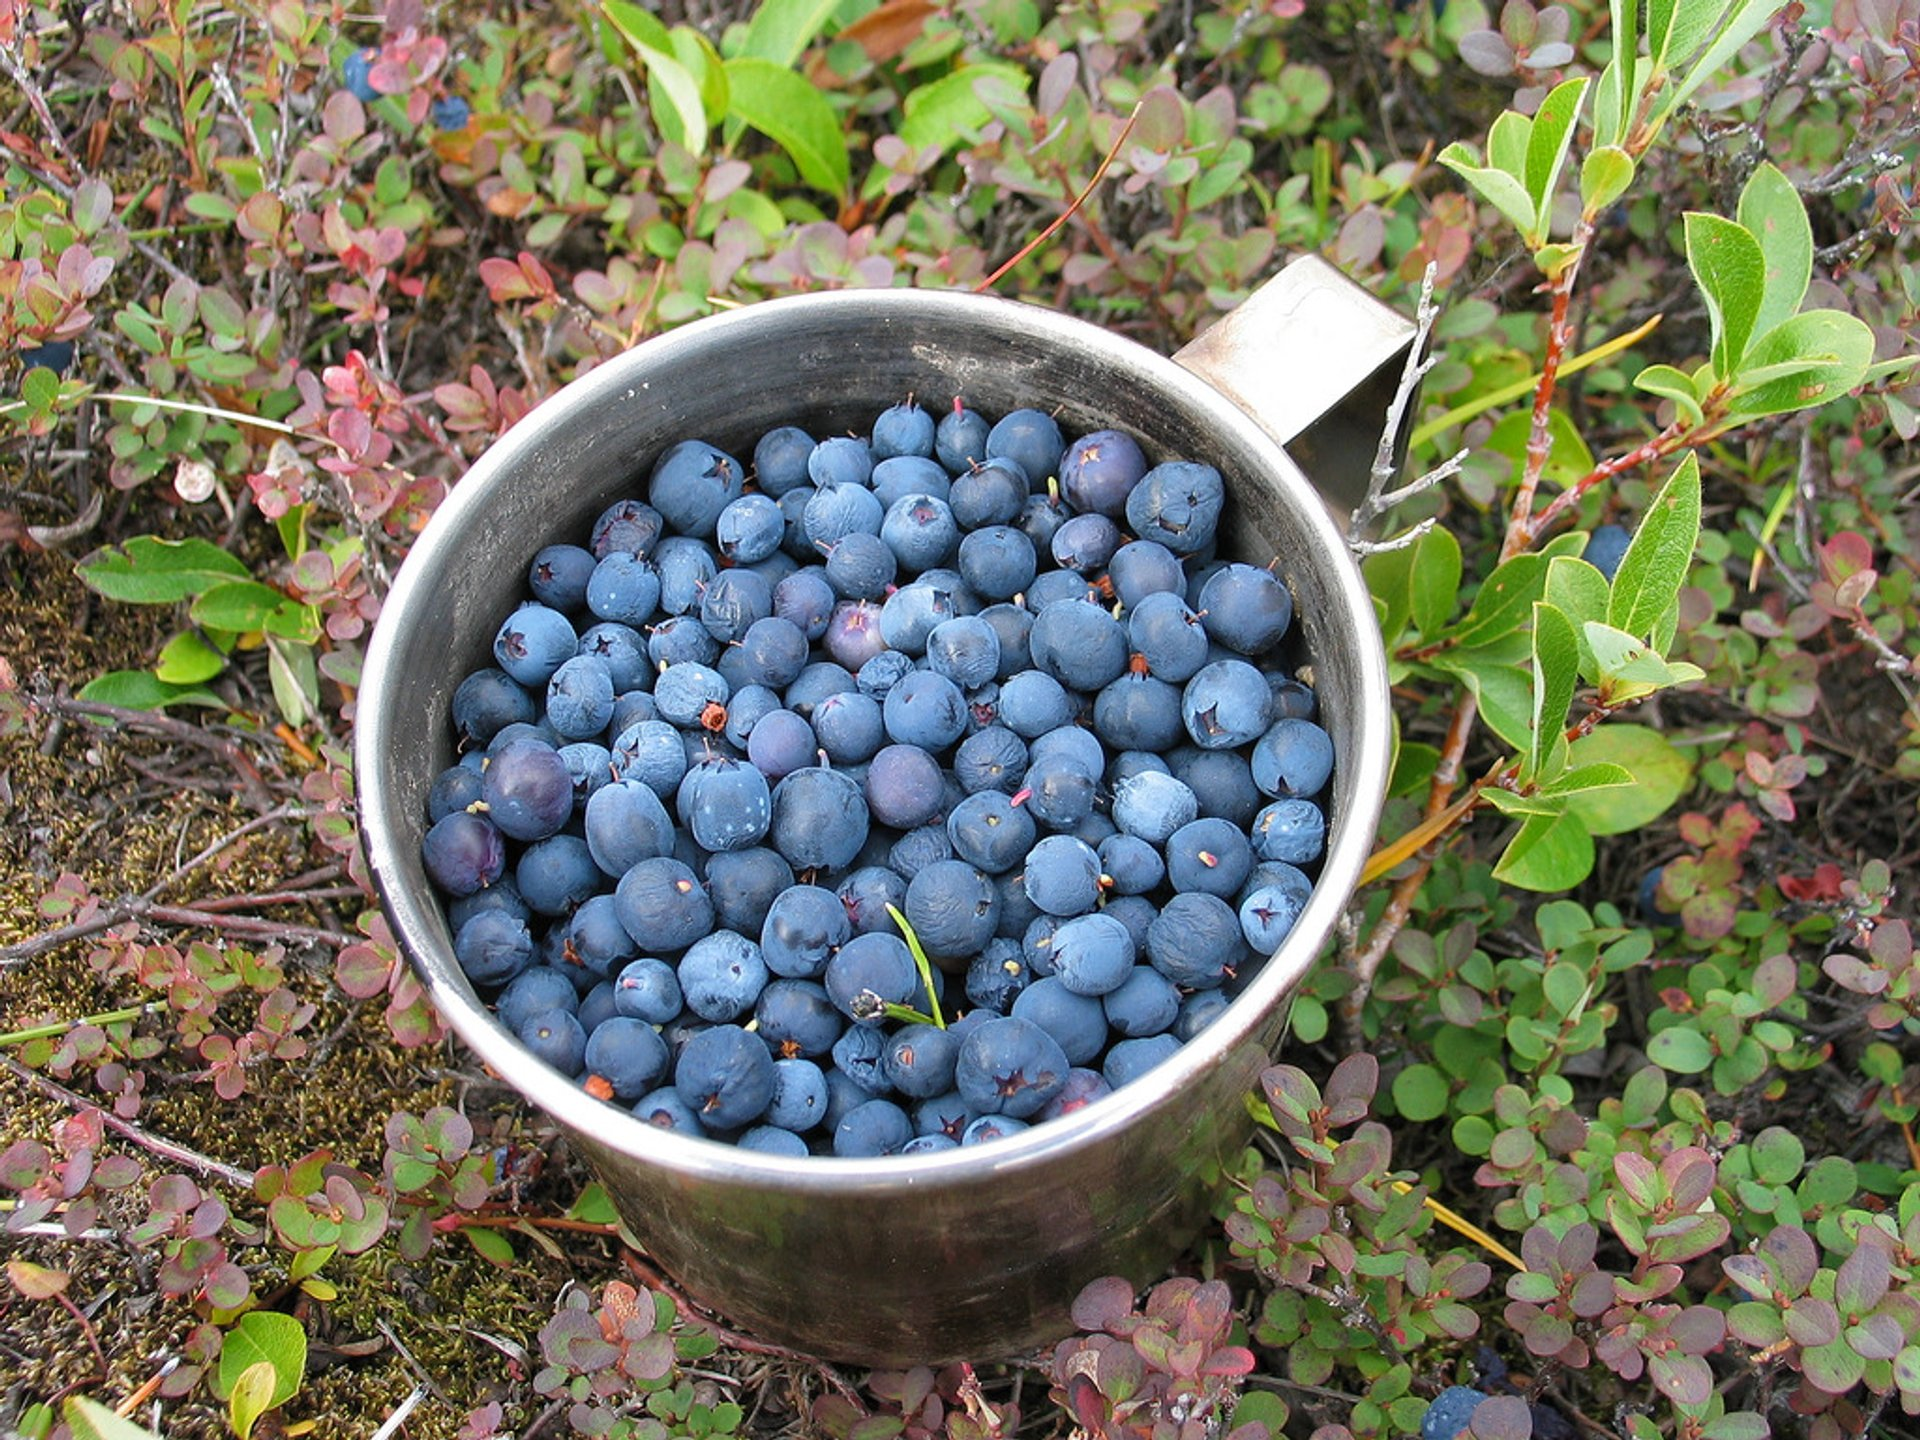 Wild Berry Season in Greenland 2019 - Best Time